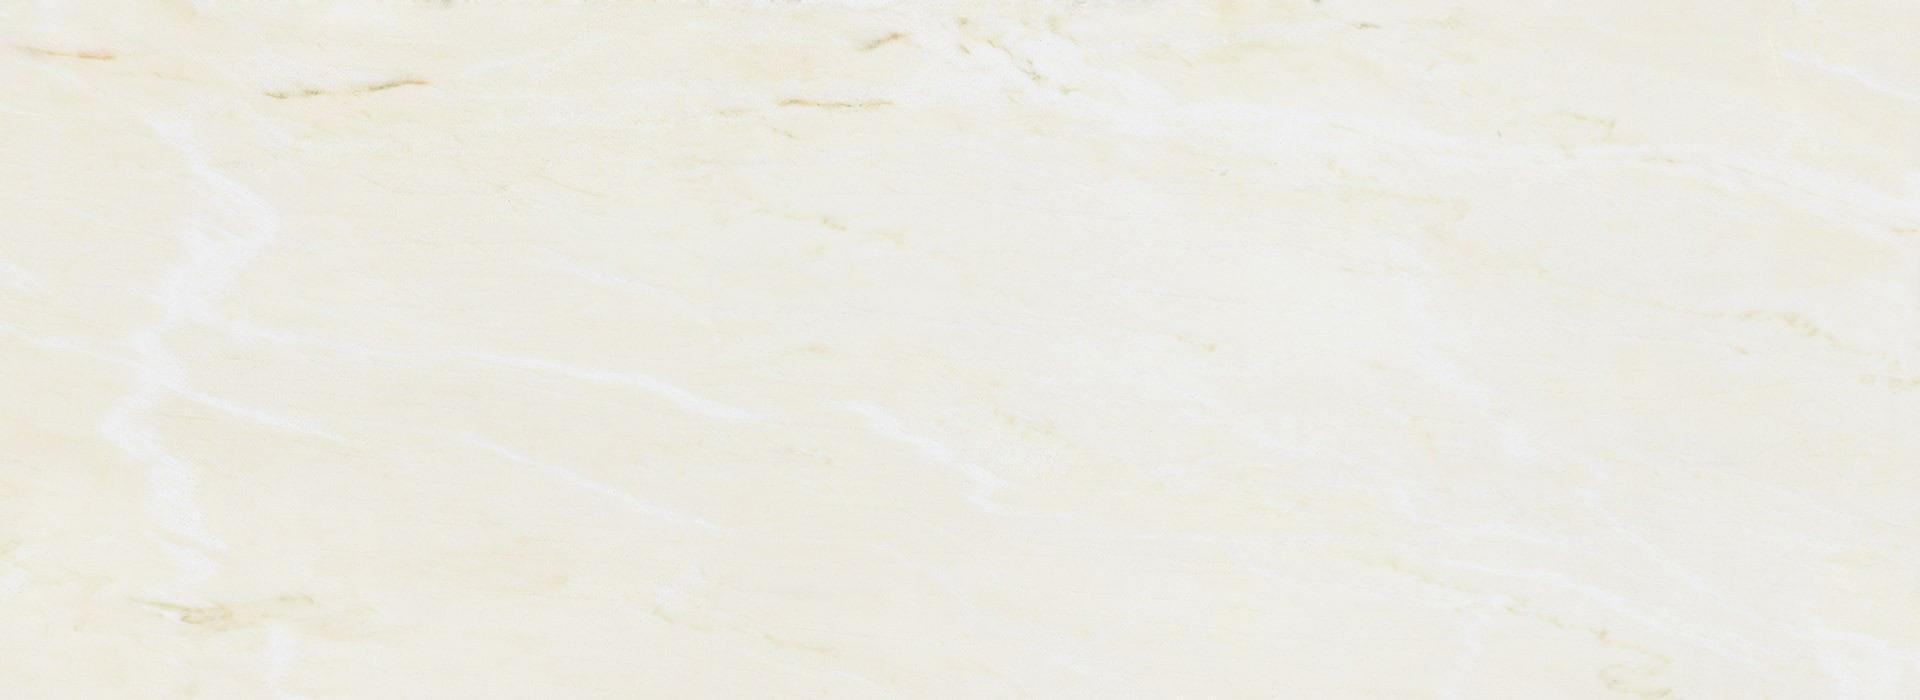 Floor Covering Ideas >> porcelain tiles, Estremoz crema Marmi